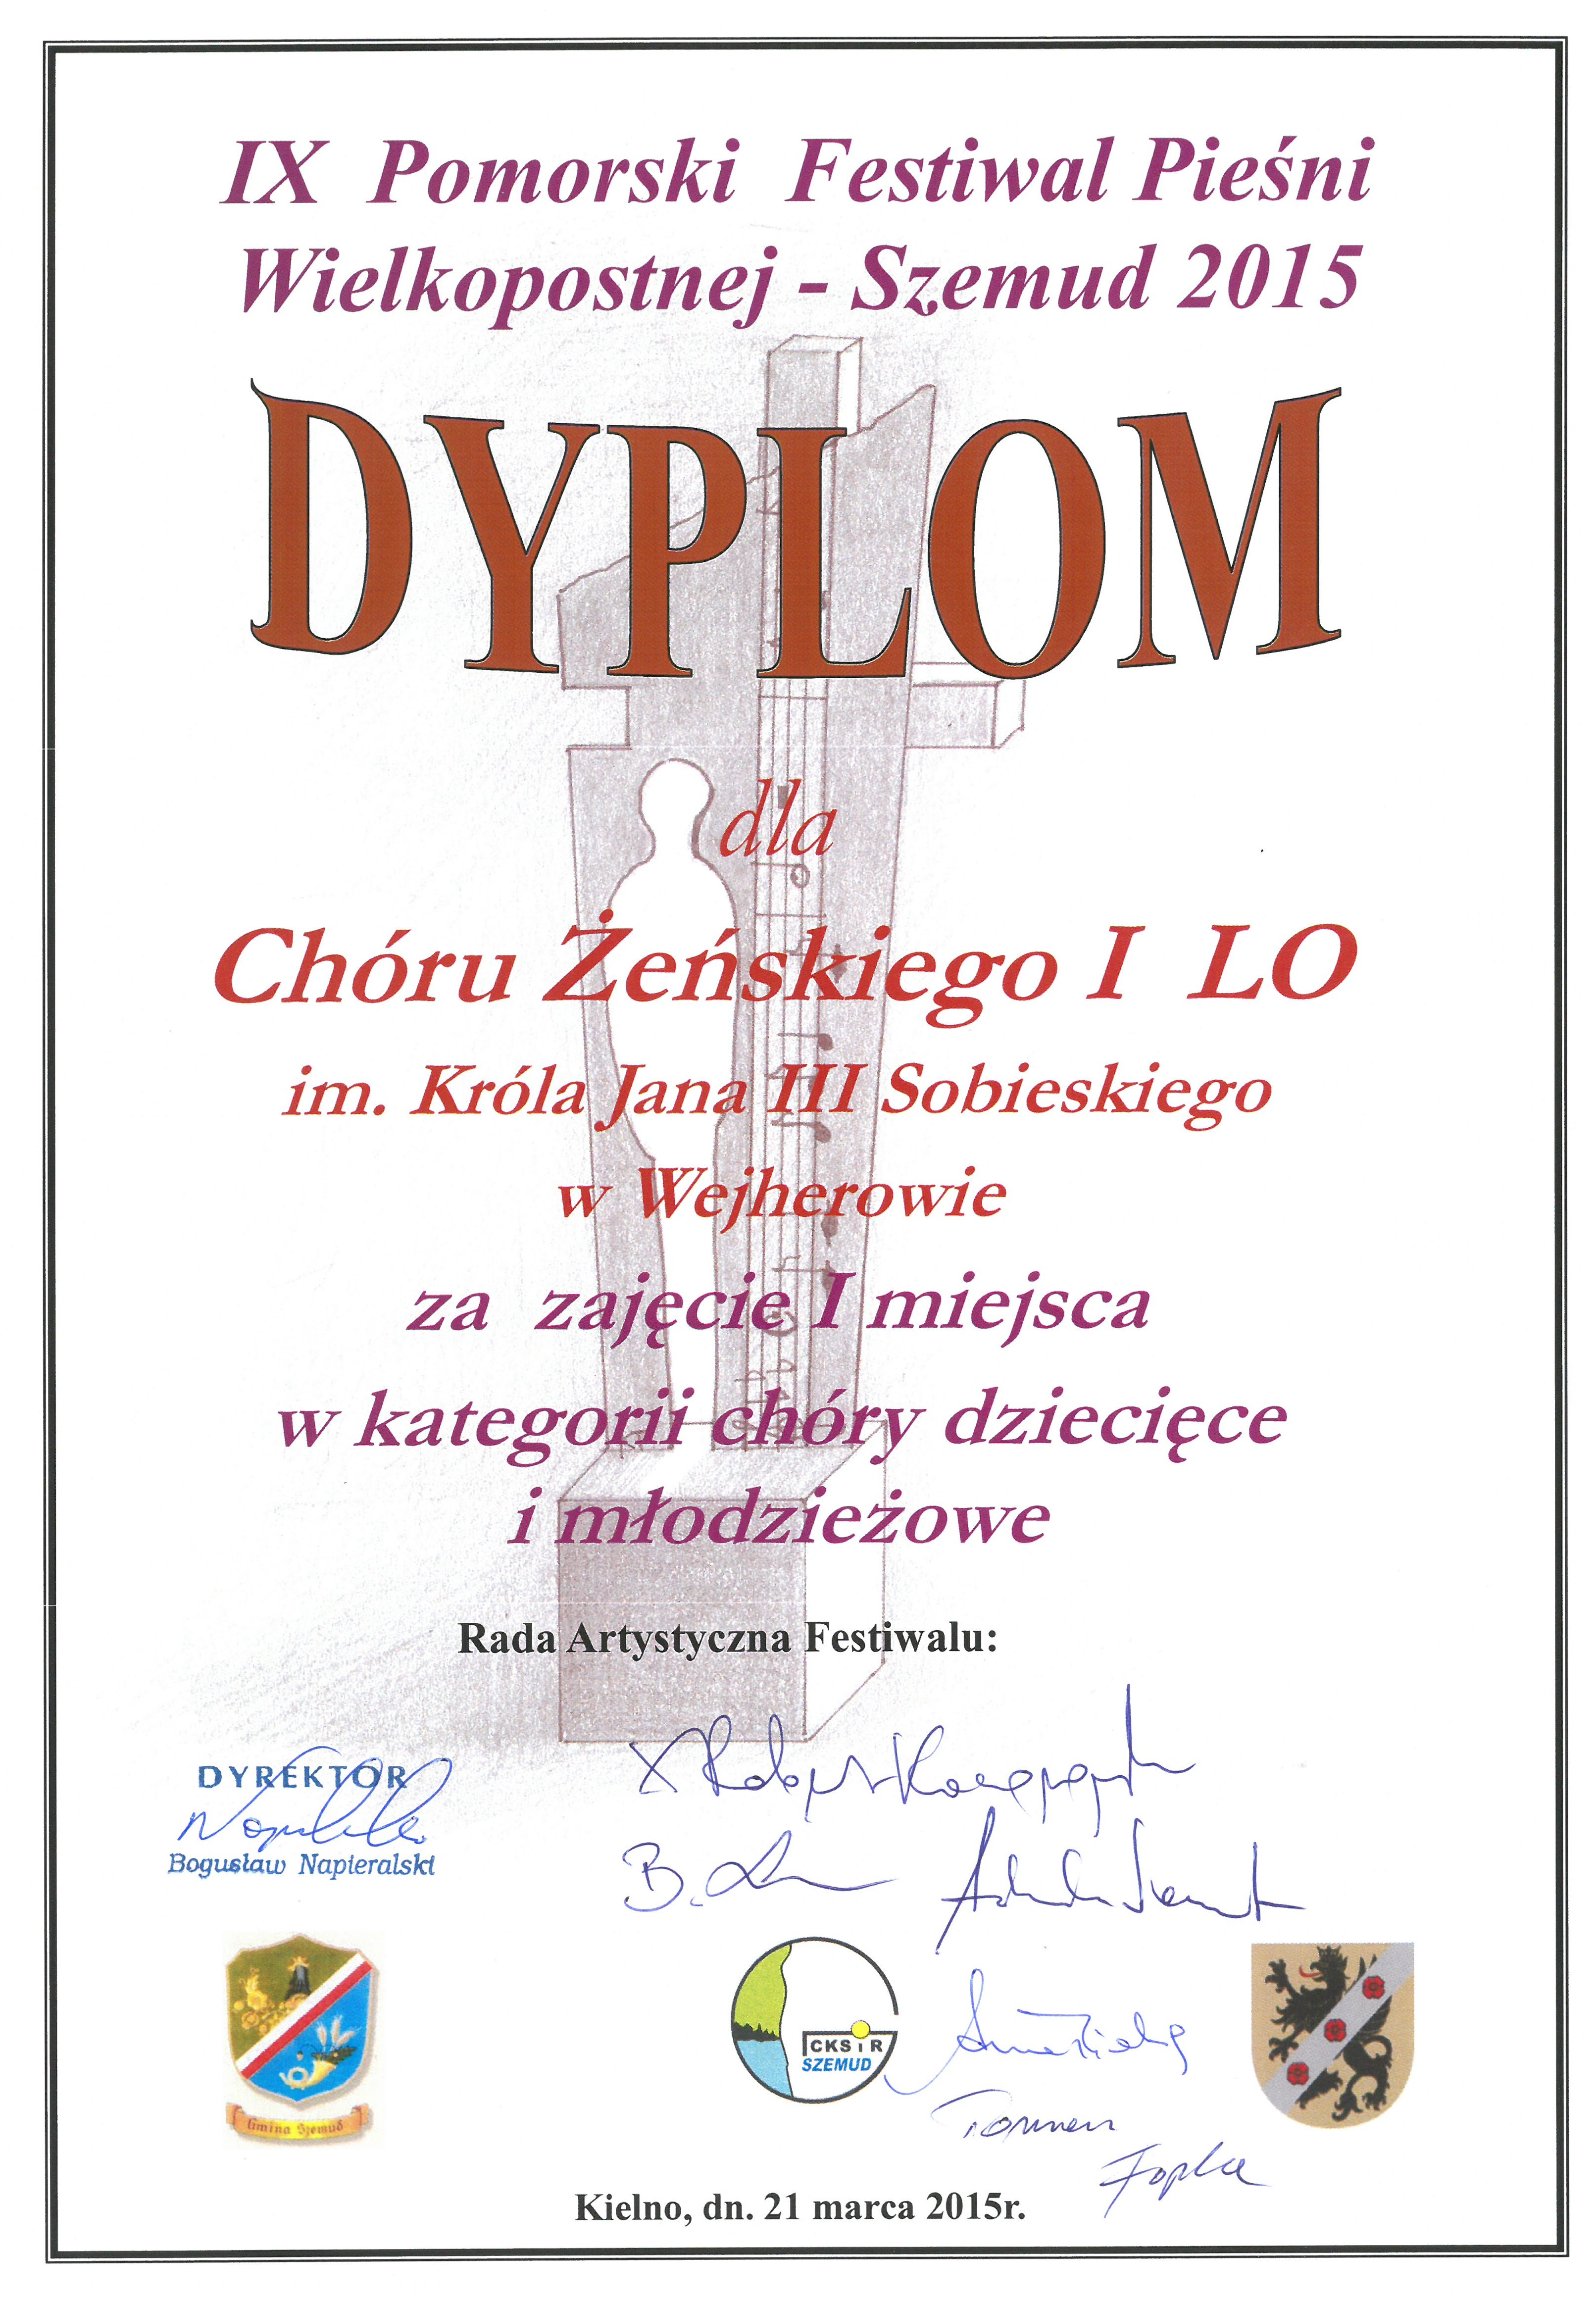 Roclawska_Kielno_2015_dyplom2